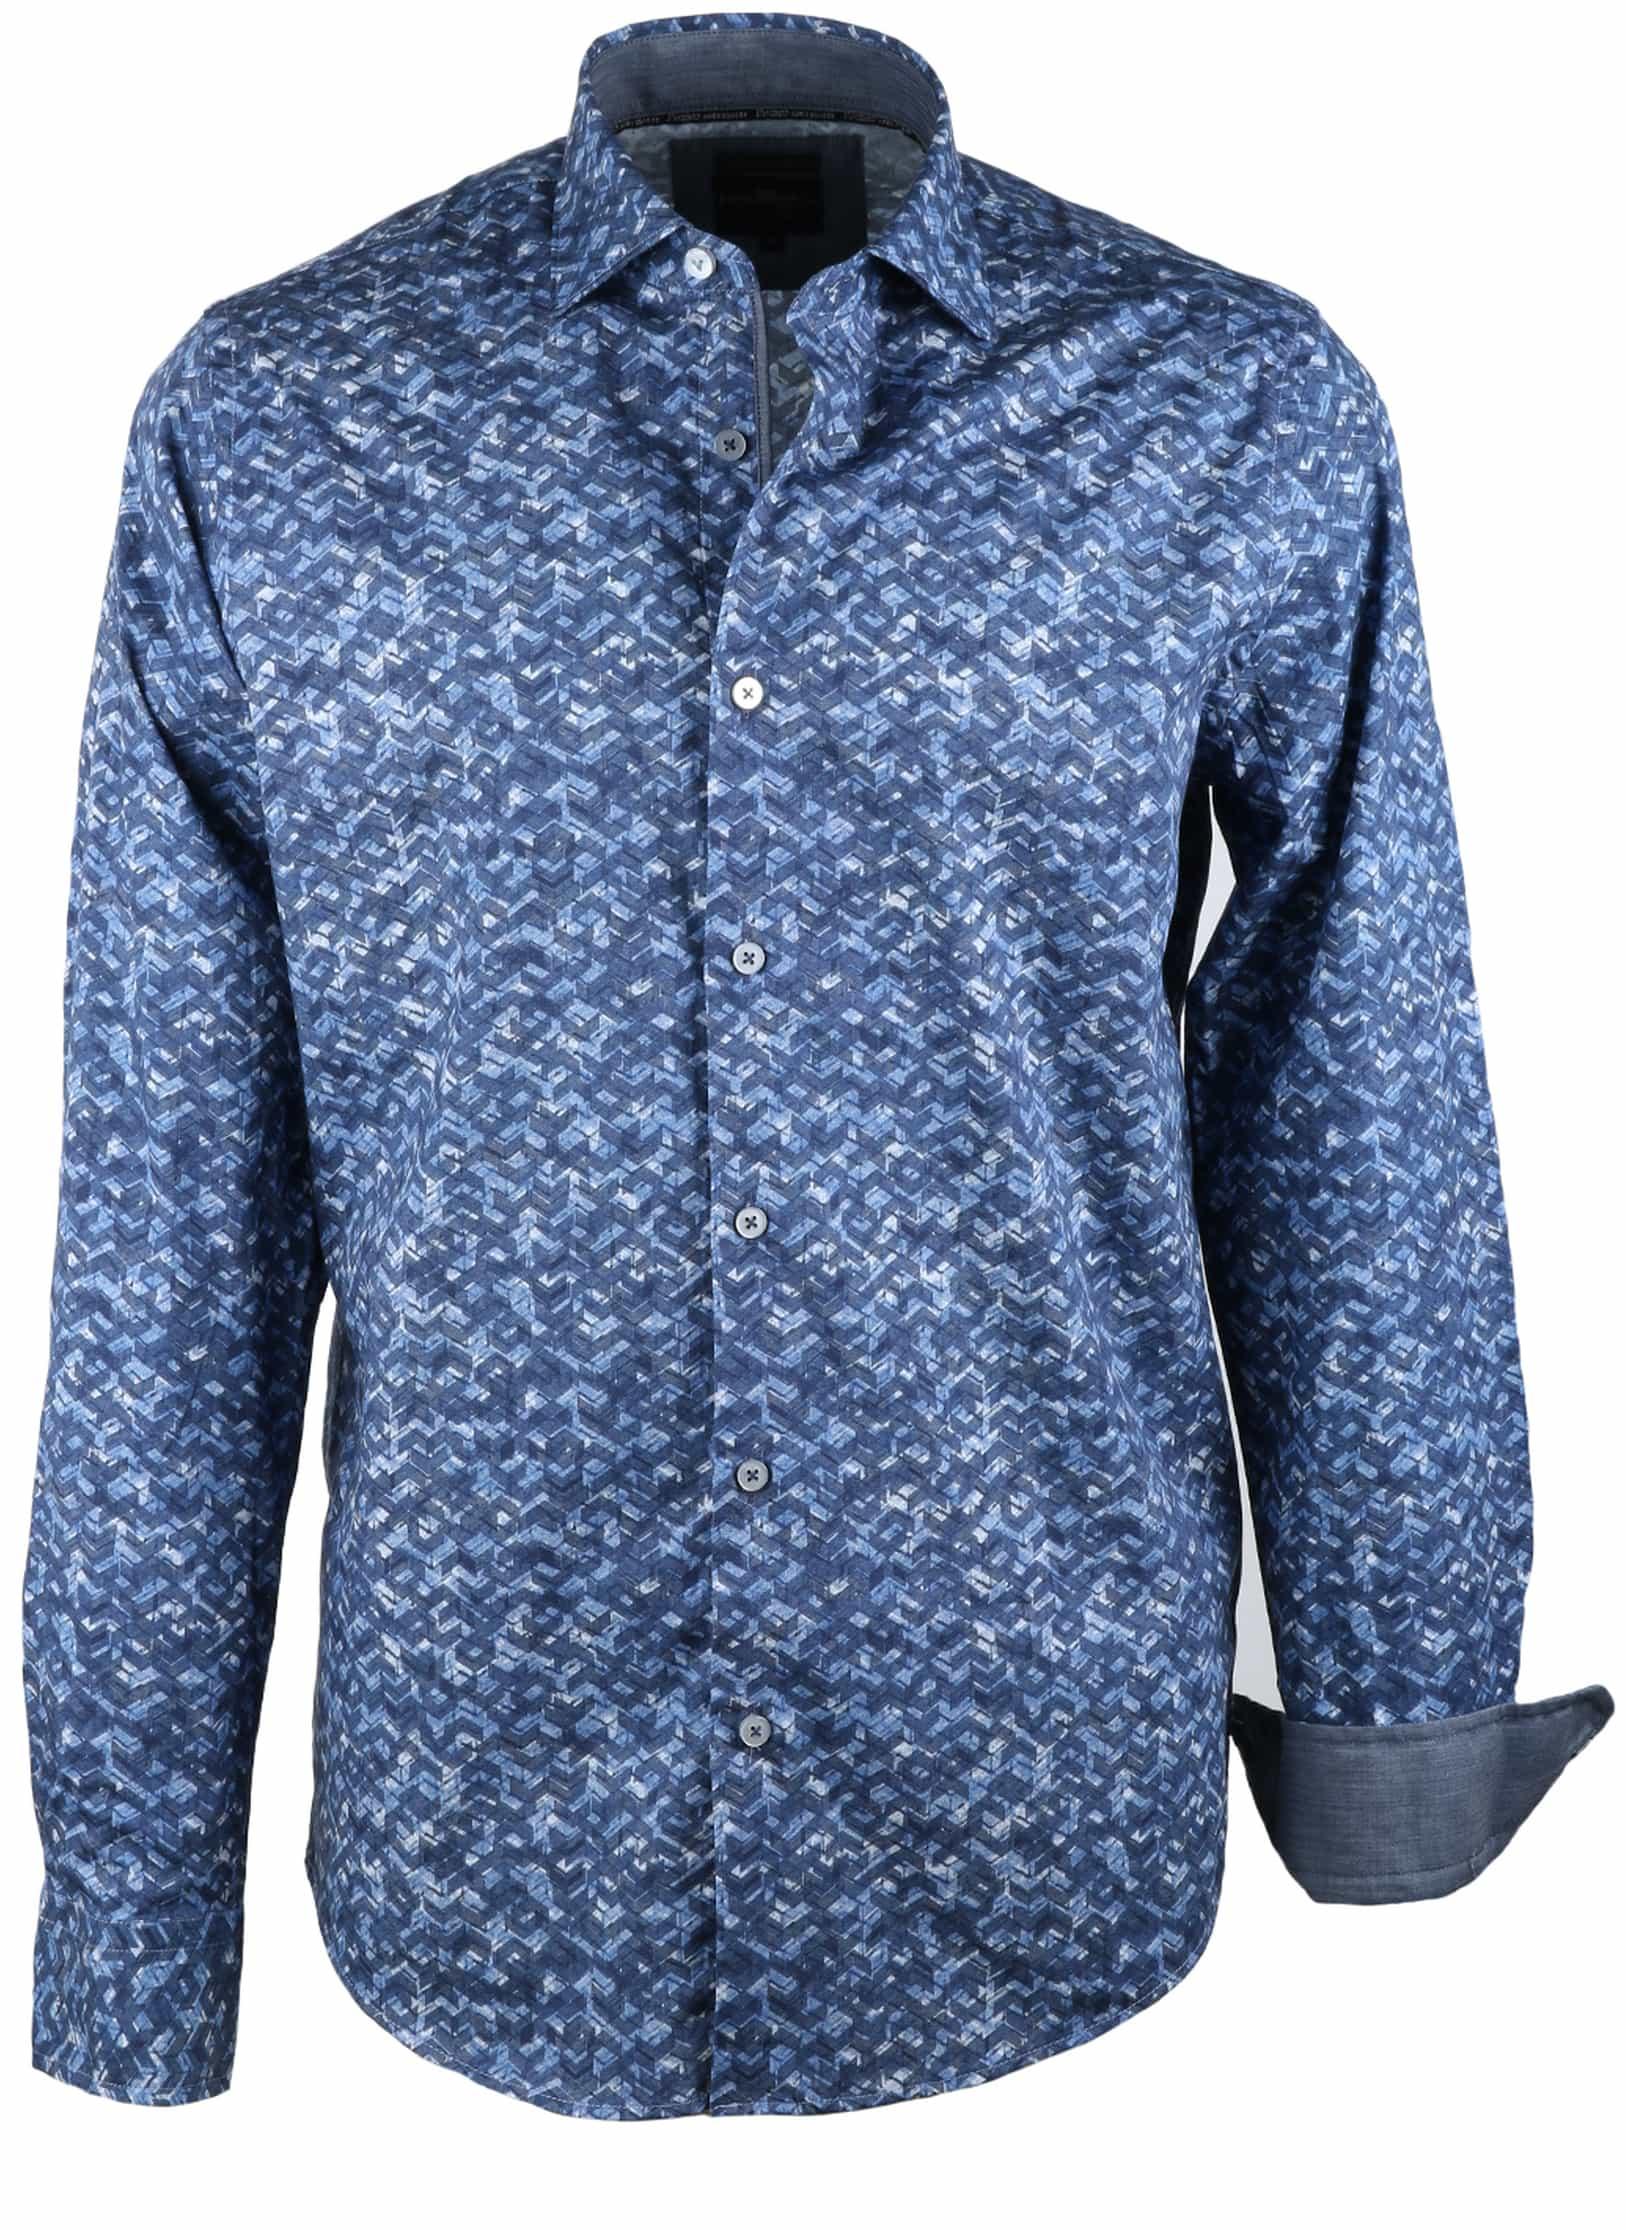 Vanguard Overhemd Blauwe Print foto 0